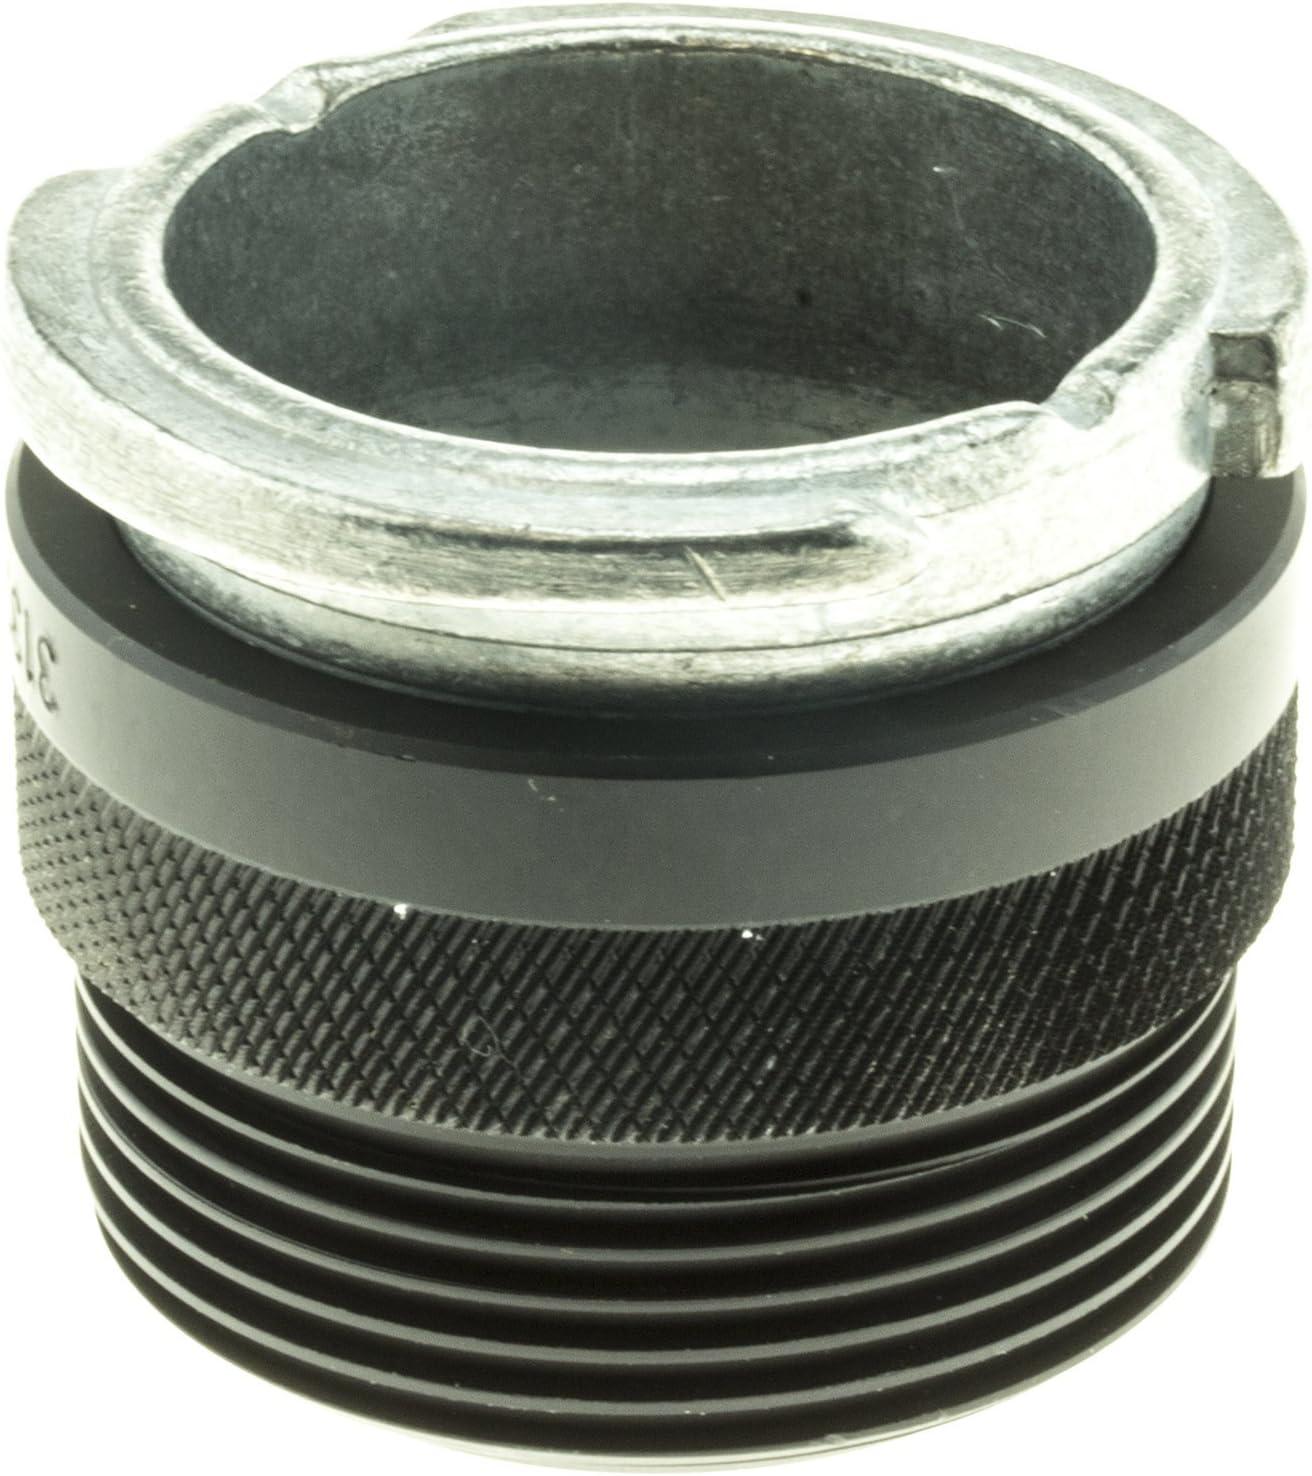 Motorad 3132 Radiator Cap Adapter